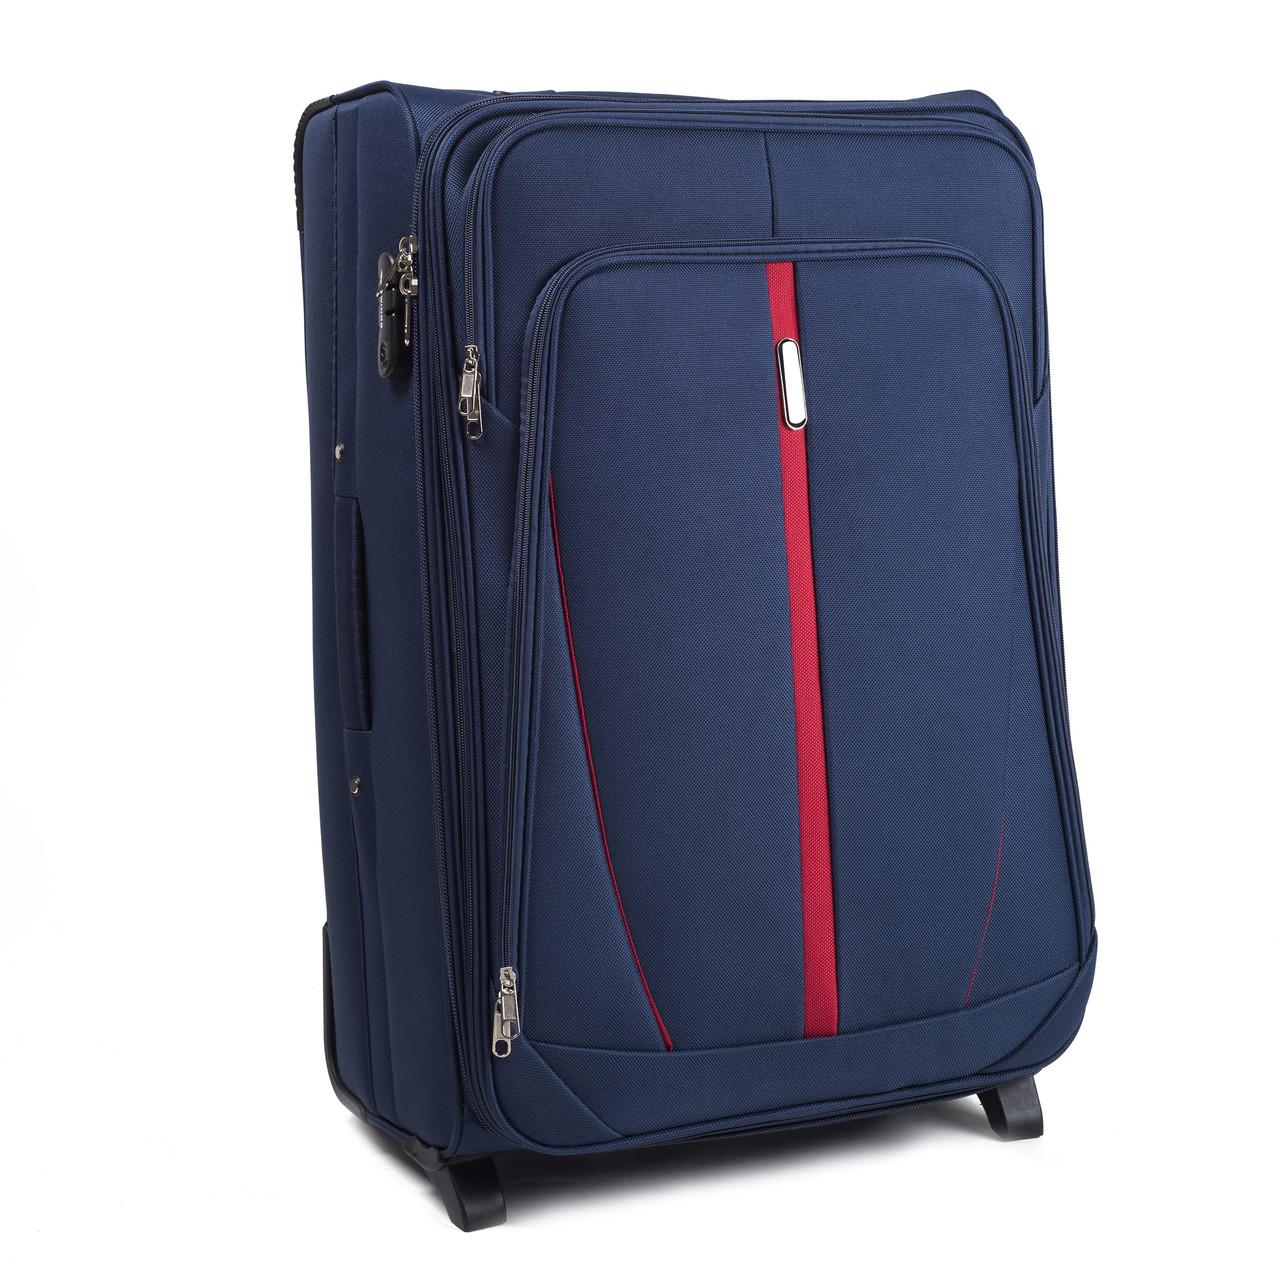 Малый тканевый чемодан Wings 1706 на 2 колесах синий, фото 1